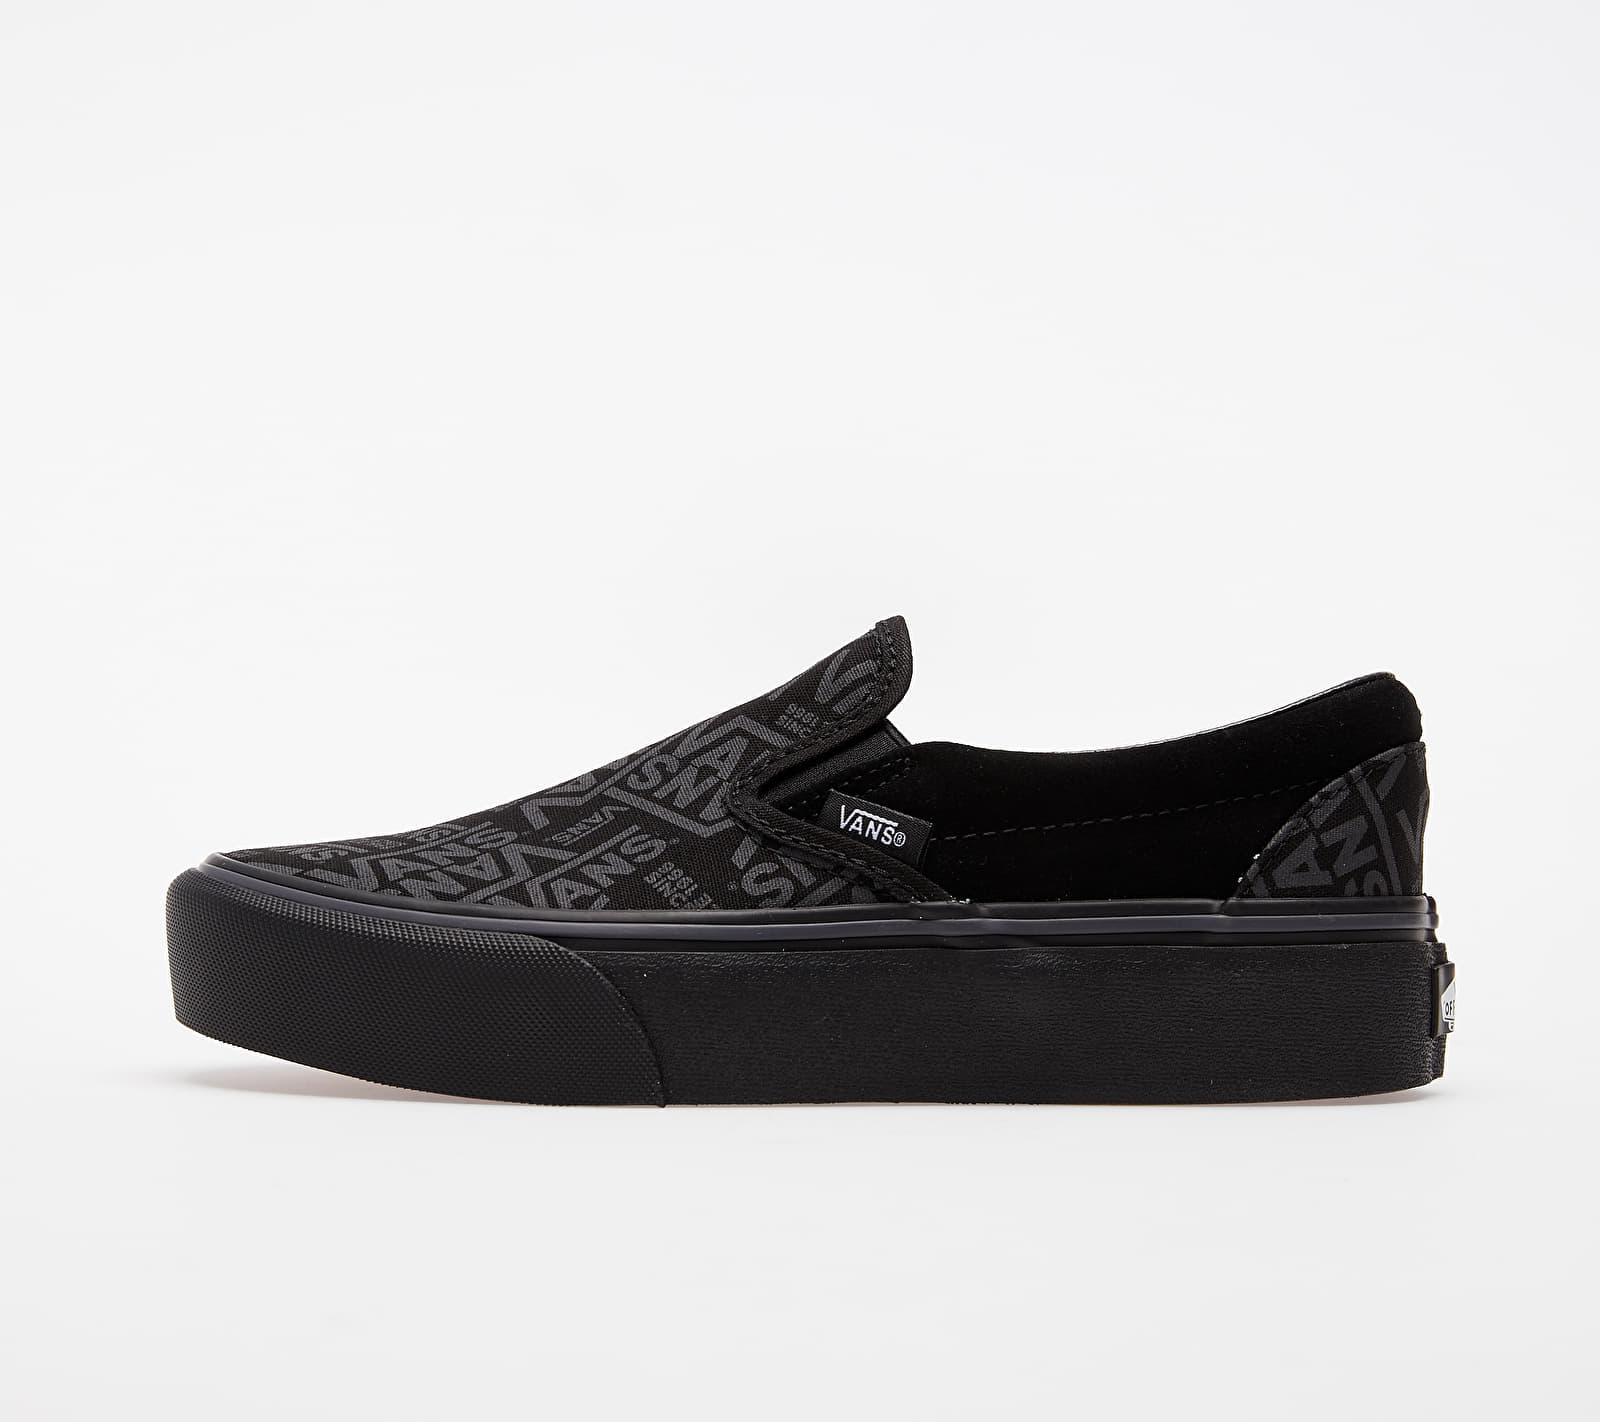 Vans Classic Slip-On Platform (Vans 66) Black EUR 37